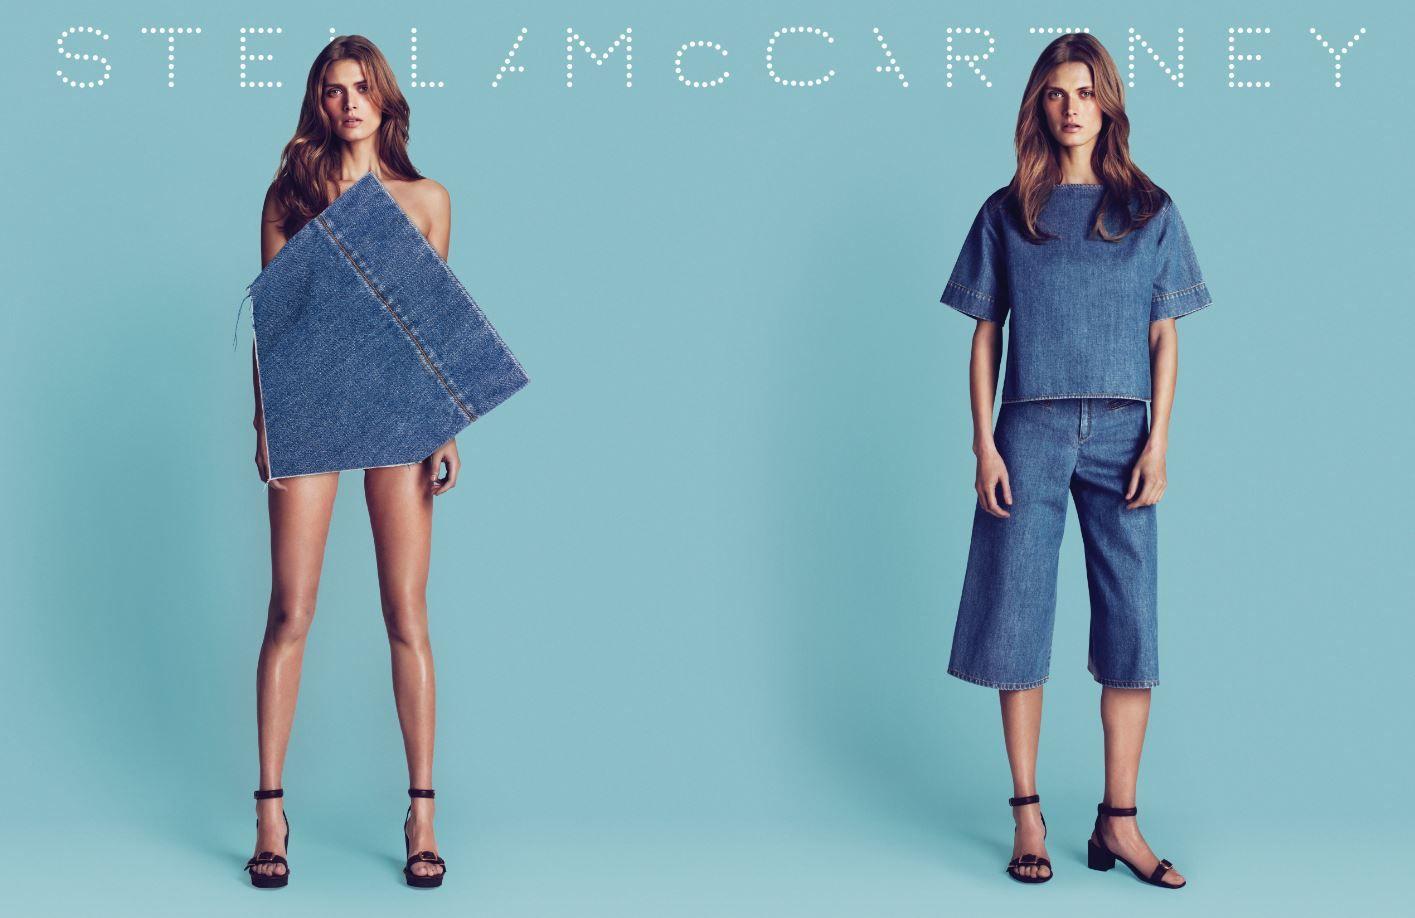 StellaMcCartney #Summer11 ad campaign | Stella mccartney